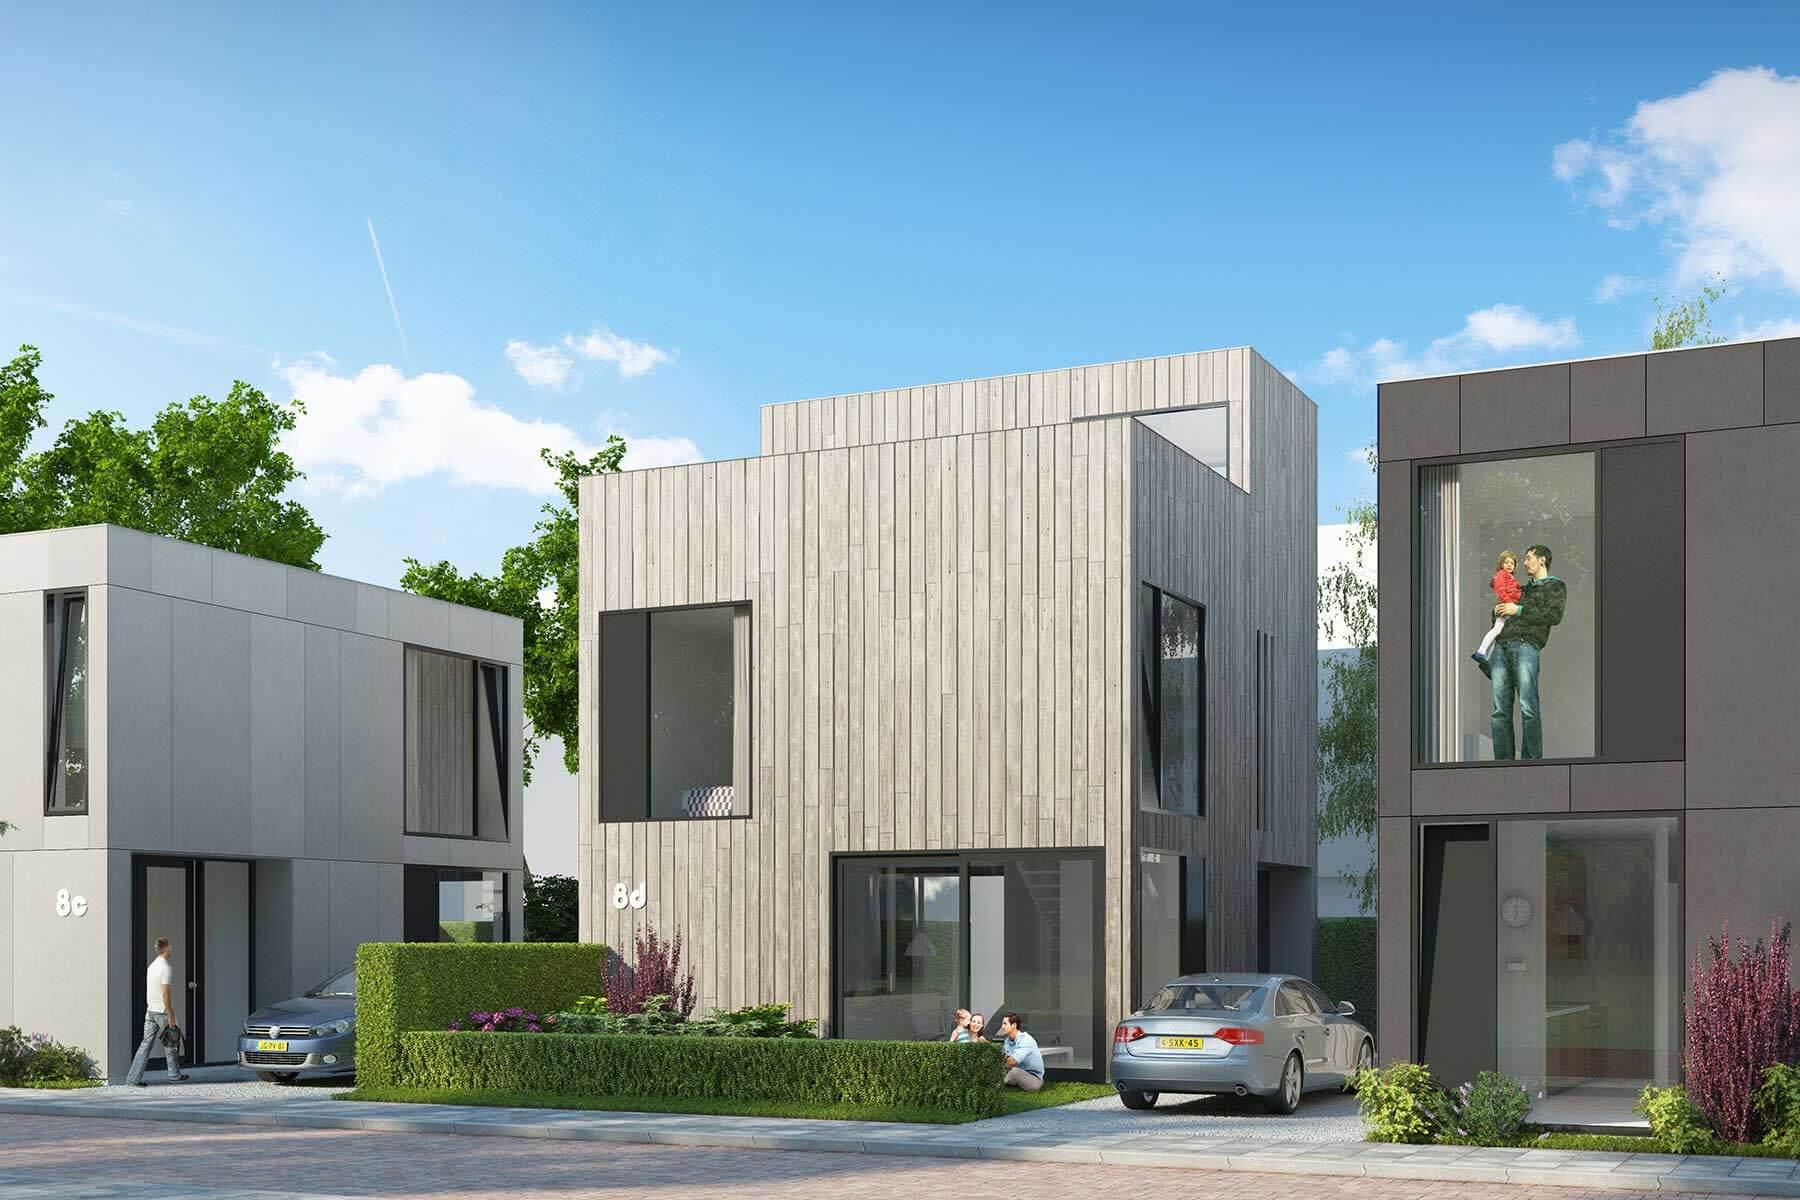 8A-Architecten-cube-house-02